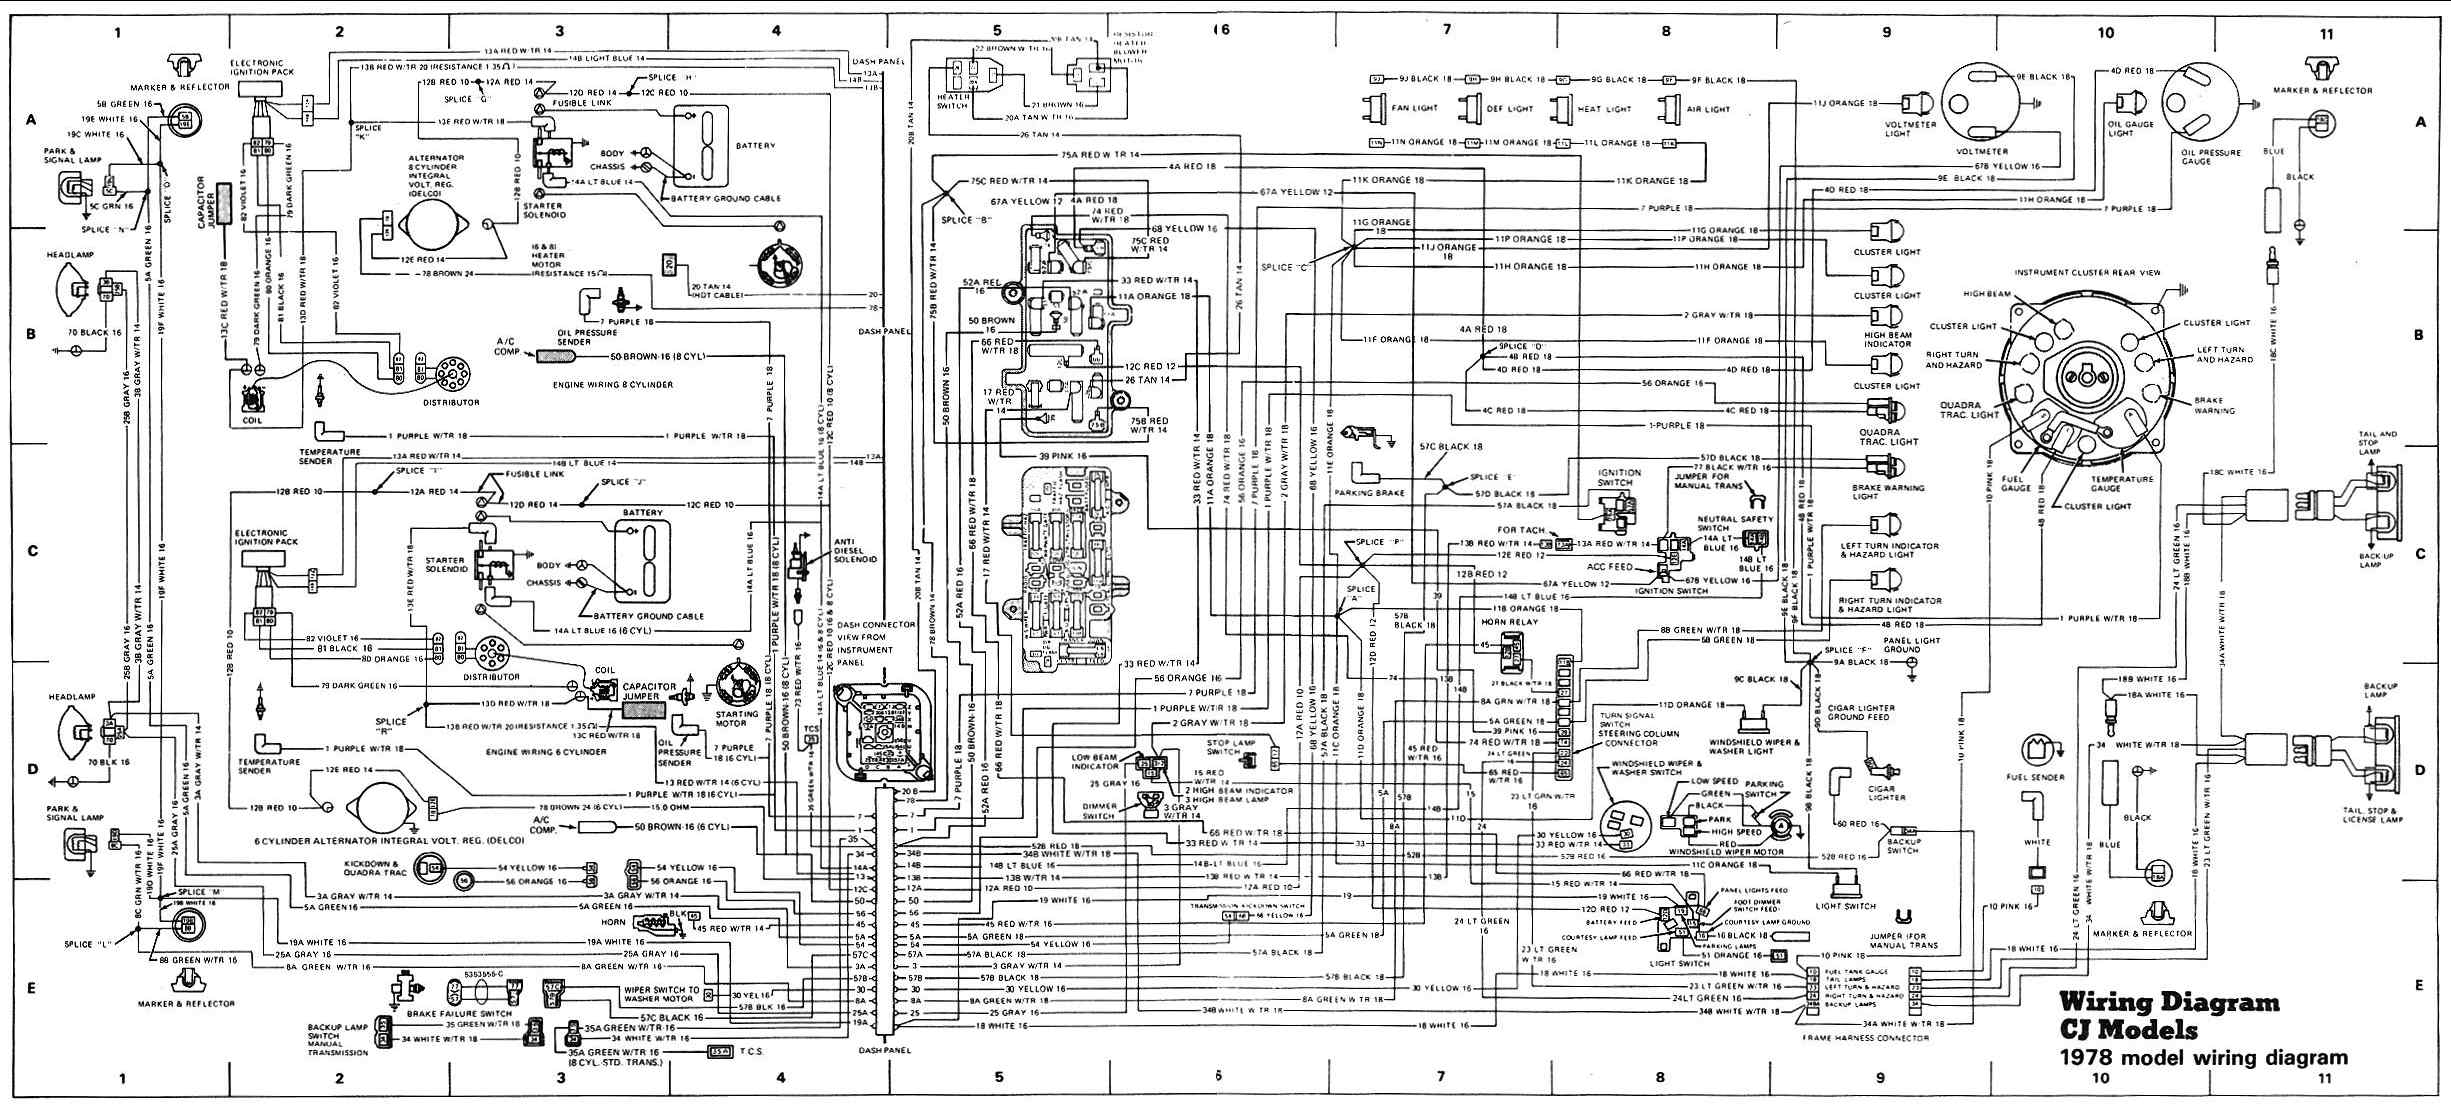 jeep car manuals wiring diagrams pdf fault codes rh automotive manuals net Range Rover P-38 Headlight Wiring-Diagram Rover Country Range Classic Wiring-Diagram1995